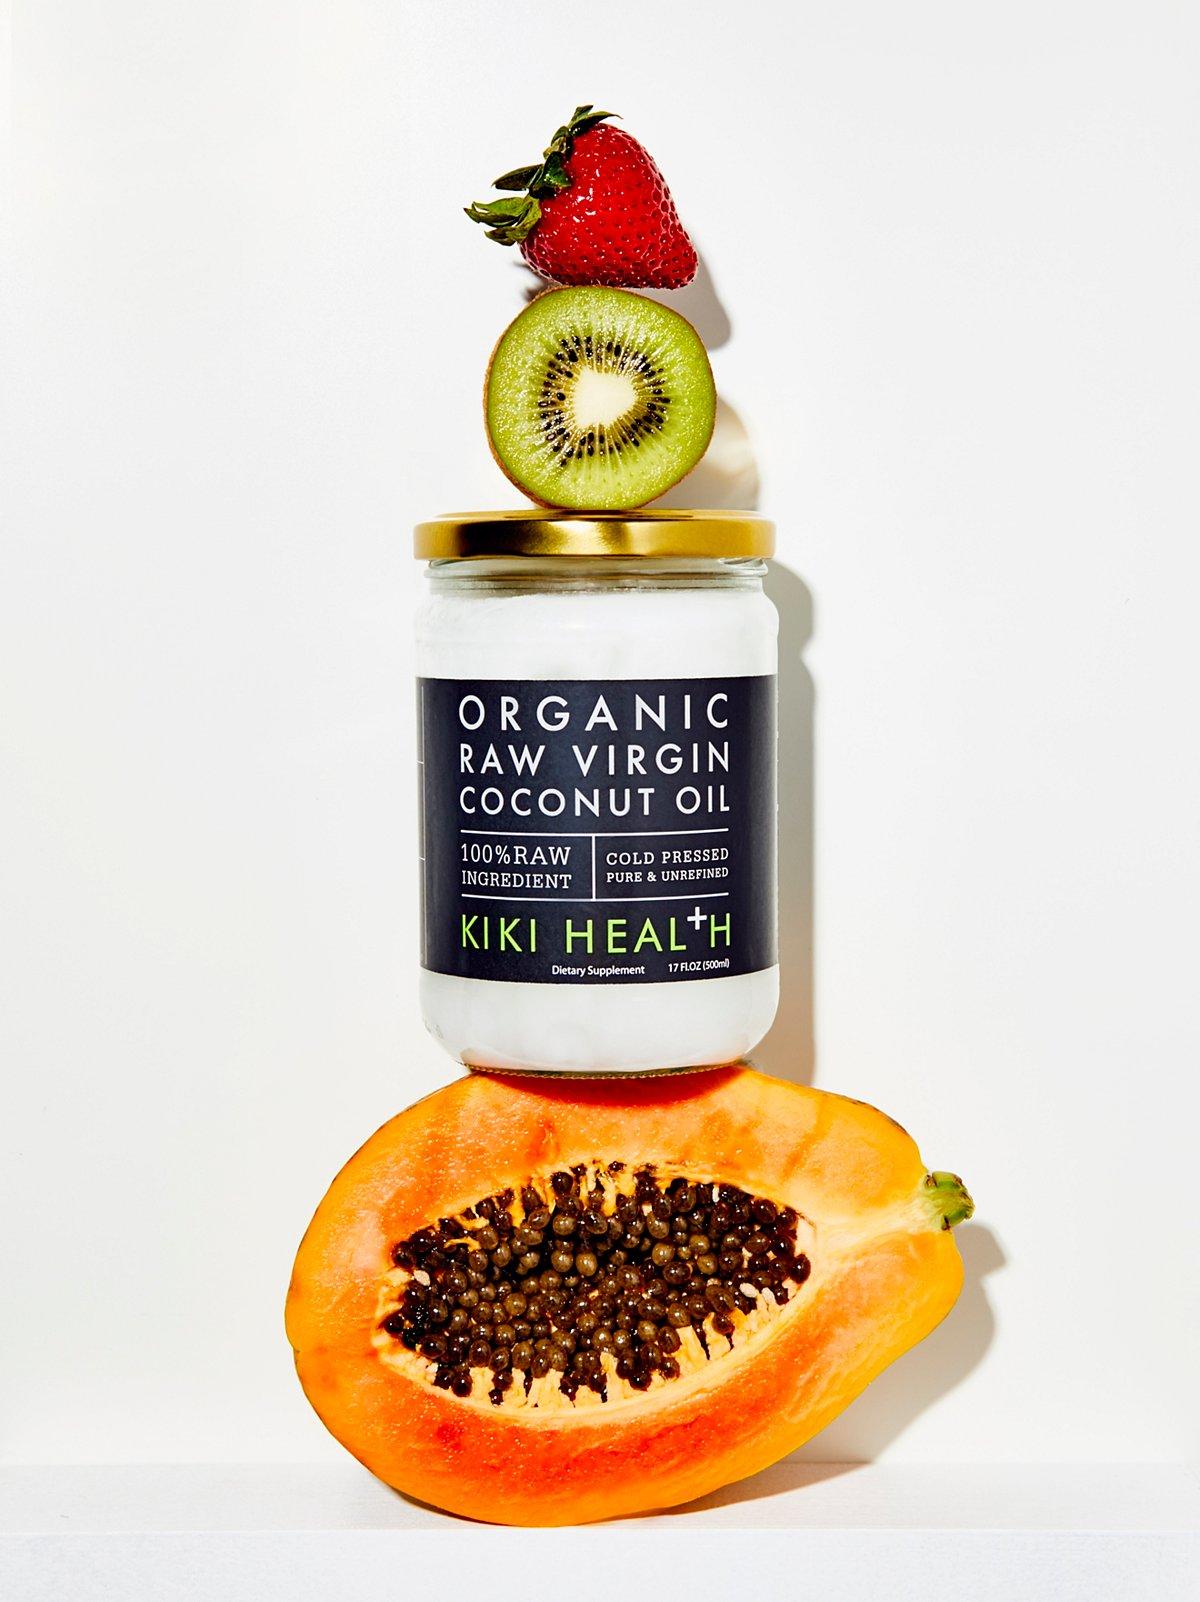 Raw Virgin Coconut Oil